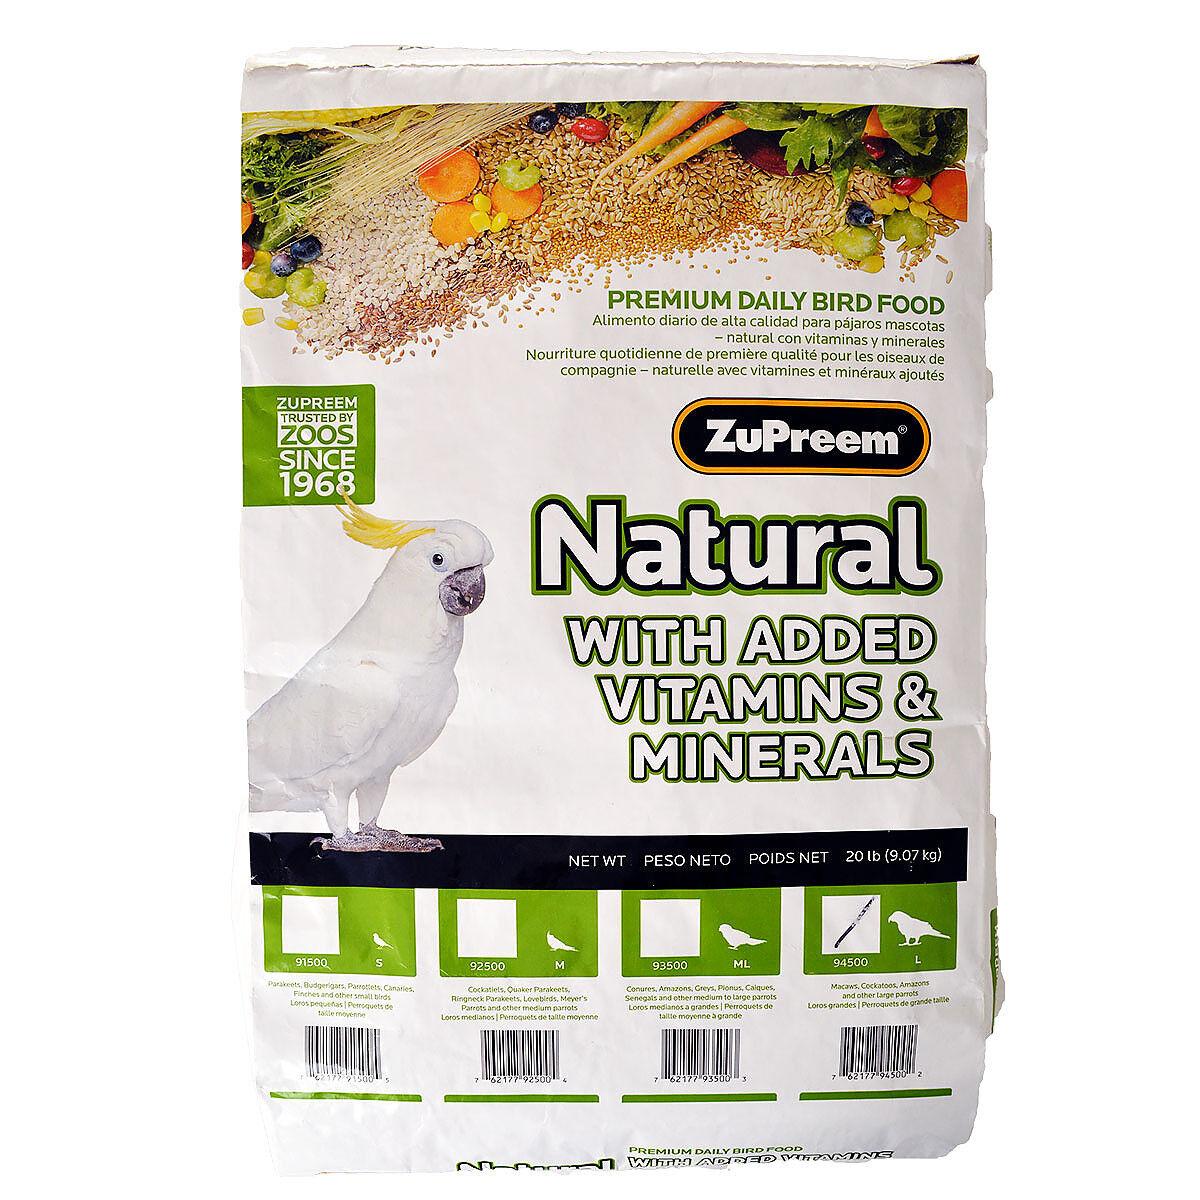 Zupreem Natural Bird Food For Large Birds